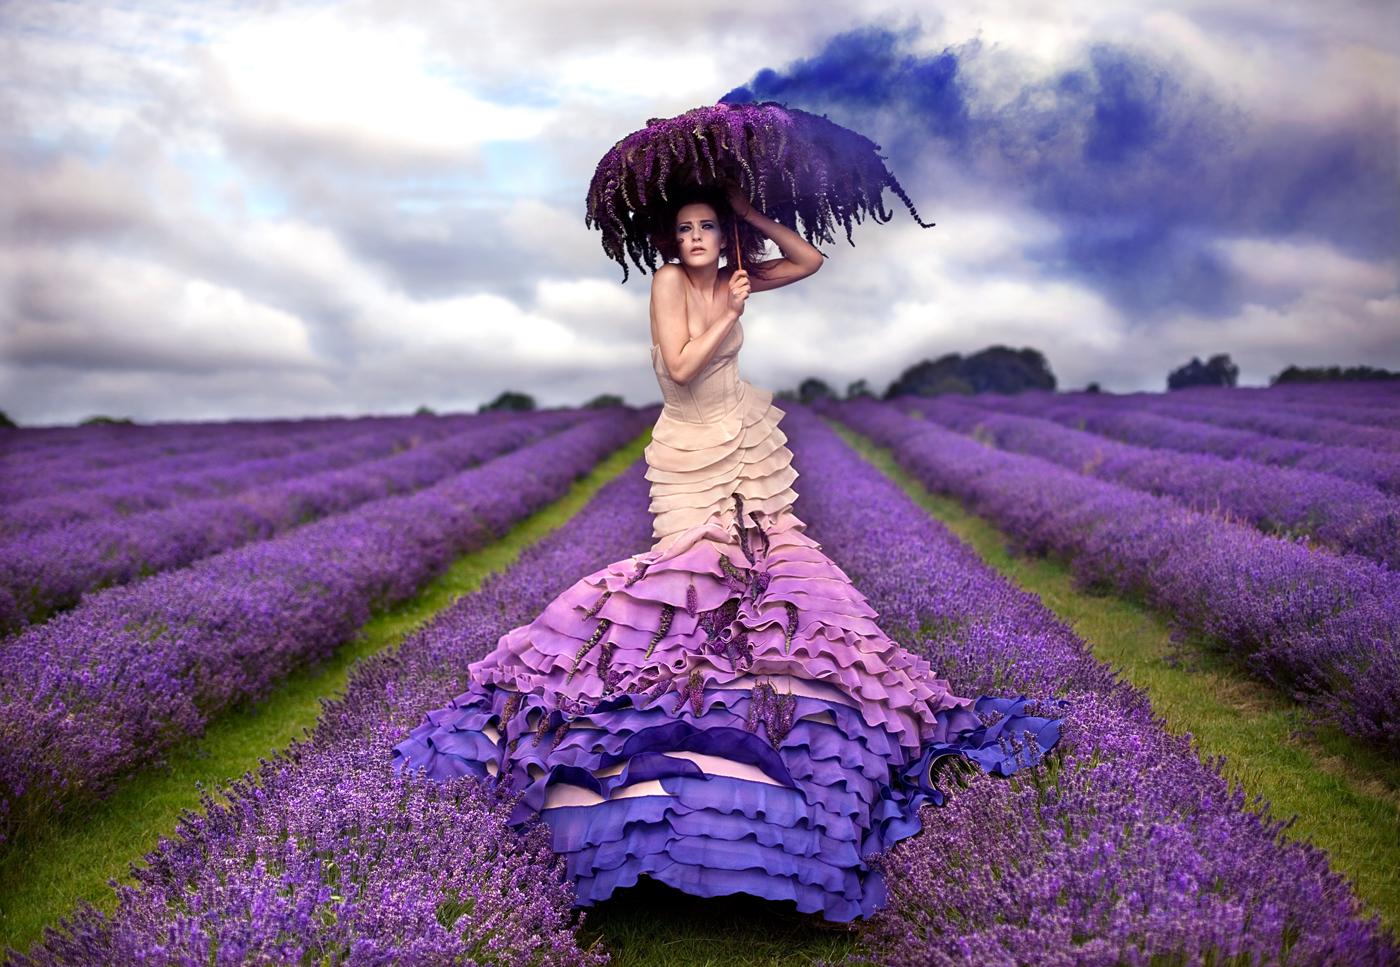 The Lavender Princess